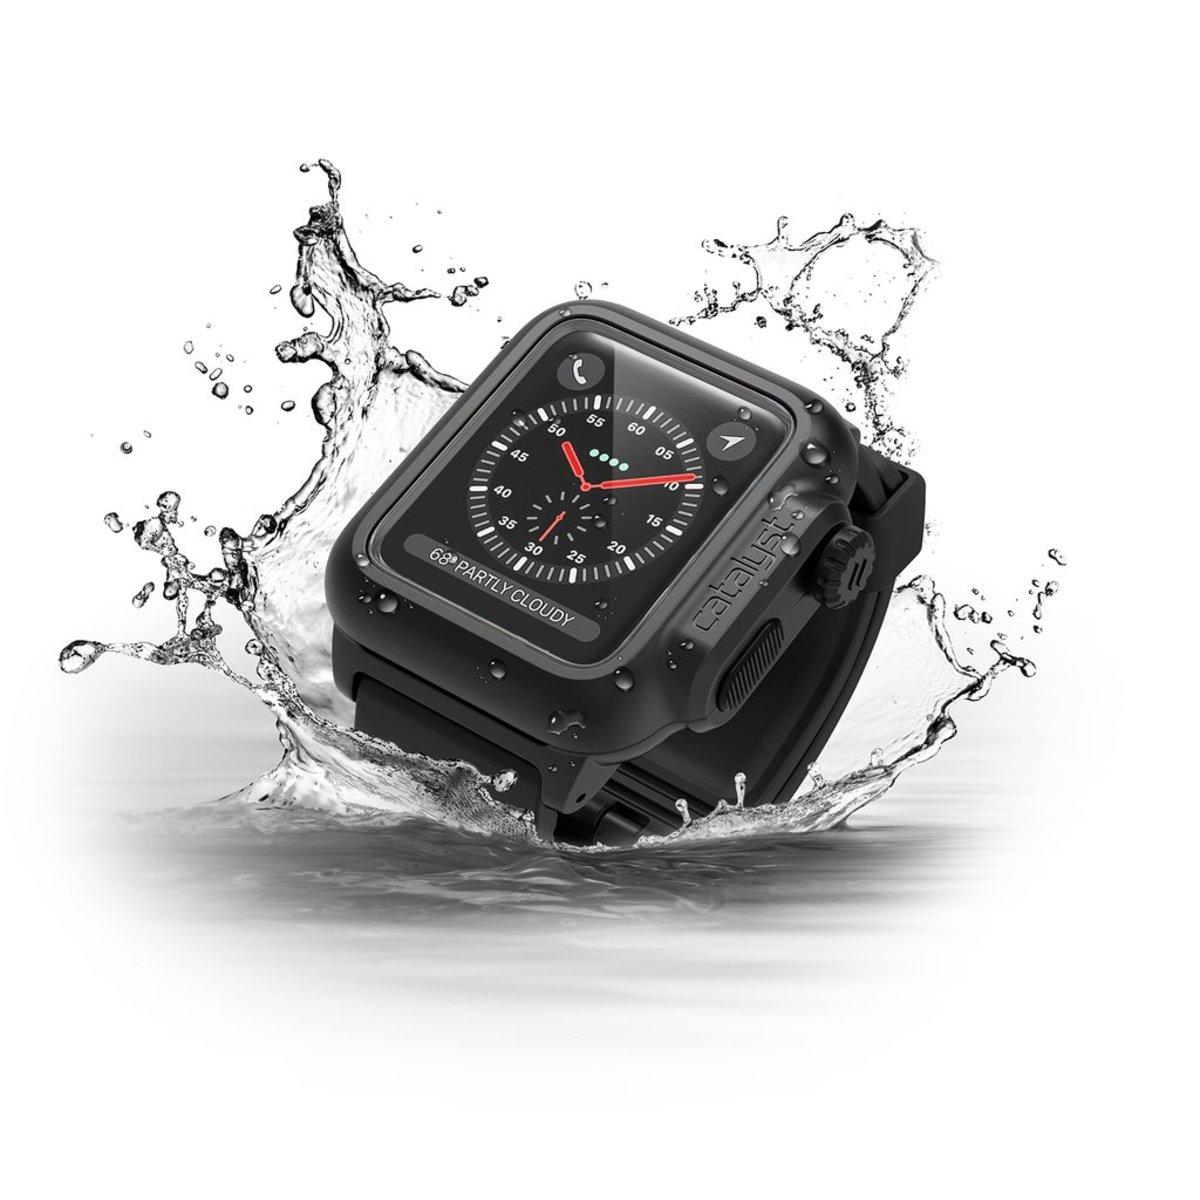 Catalyst® 高級防水防撞保護裝甲外殼 (42mm Apple Watch Series 2/3) - 黑色